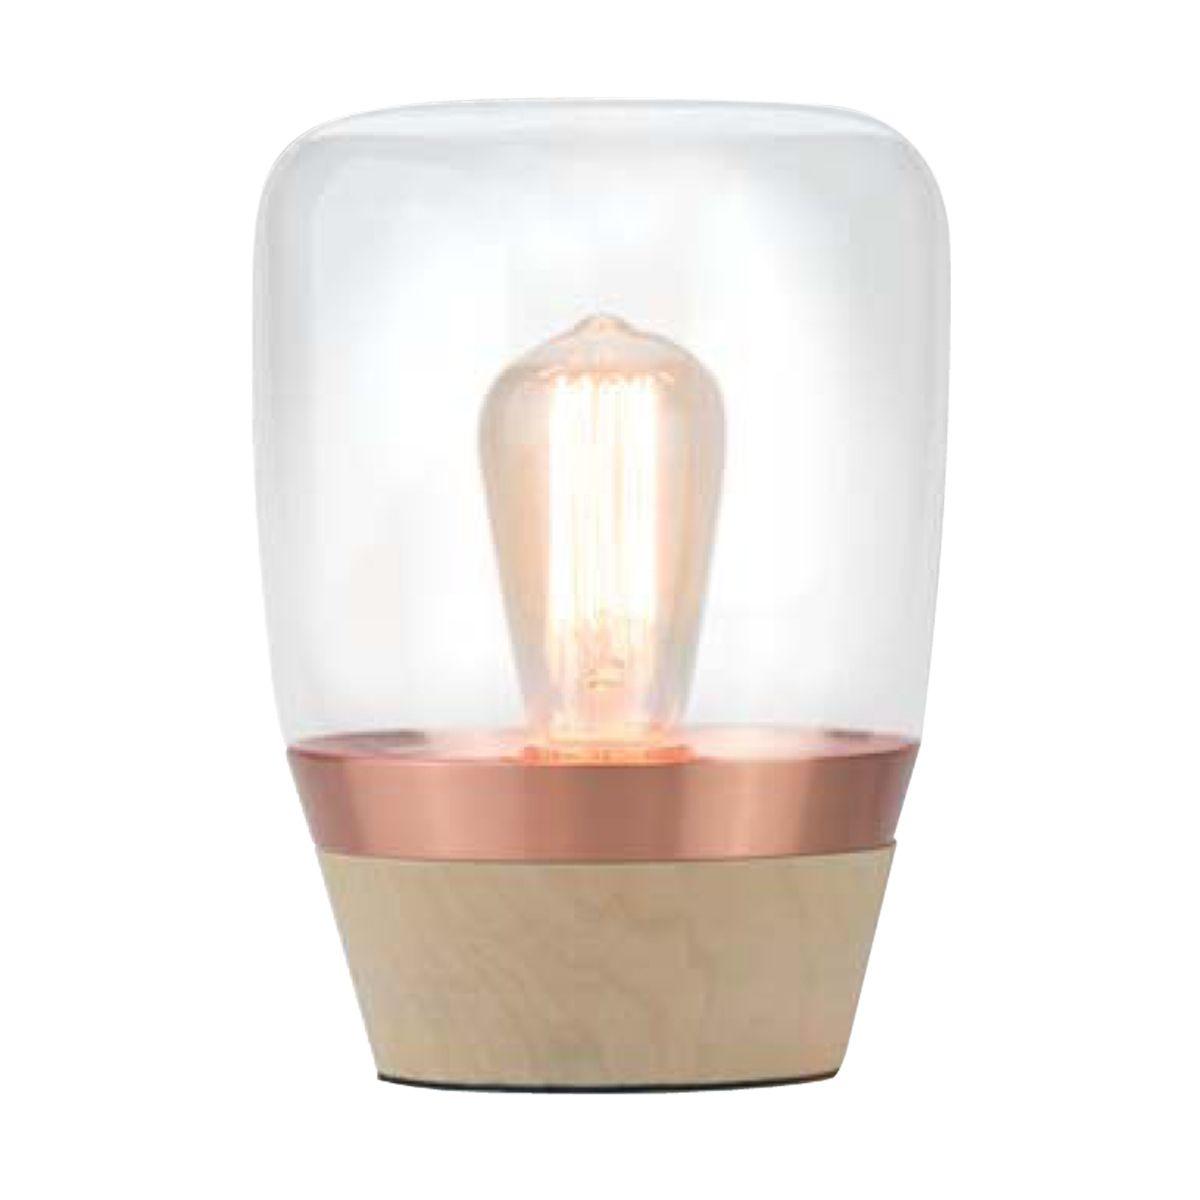 Rose Gold Look Lamp Kmart Lamp Contemporary Living Room Edison Light Bulbs